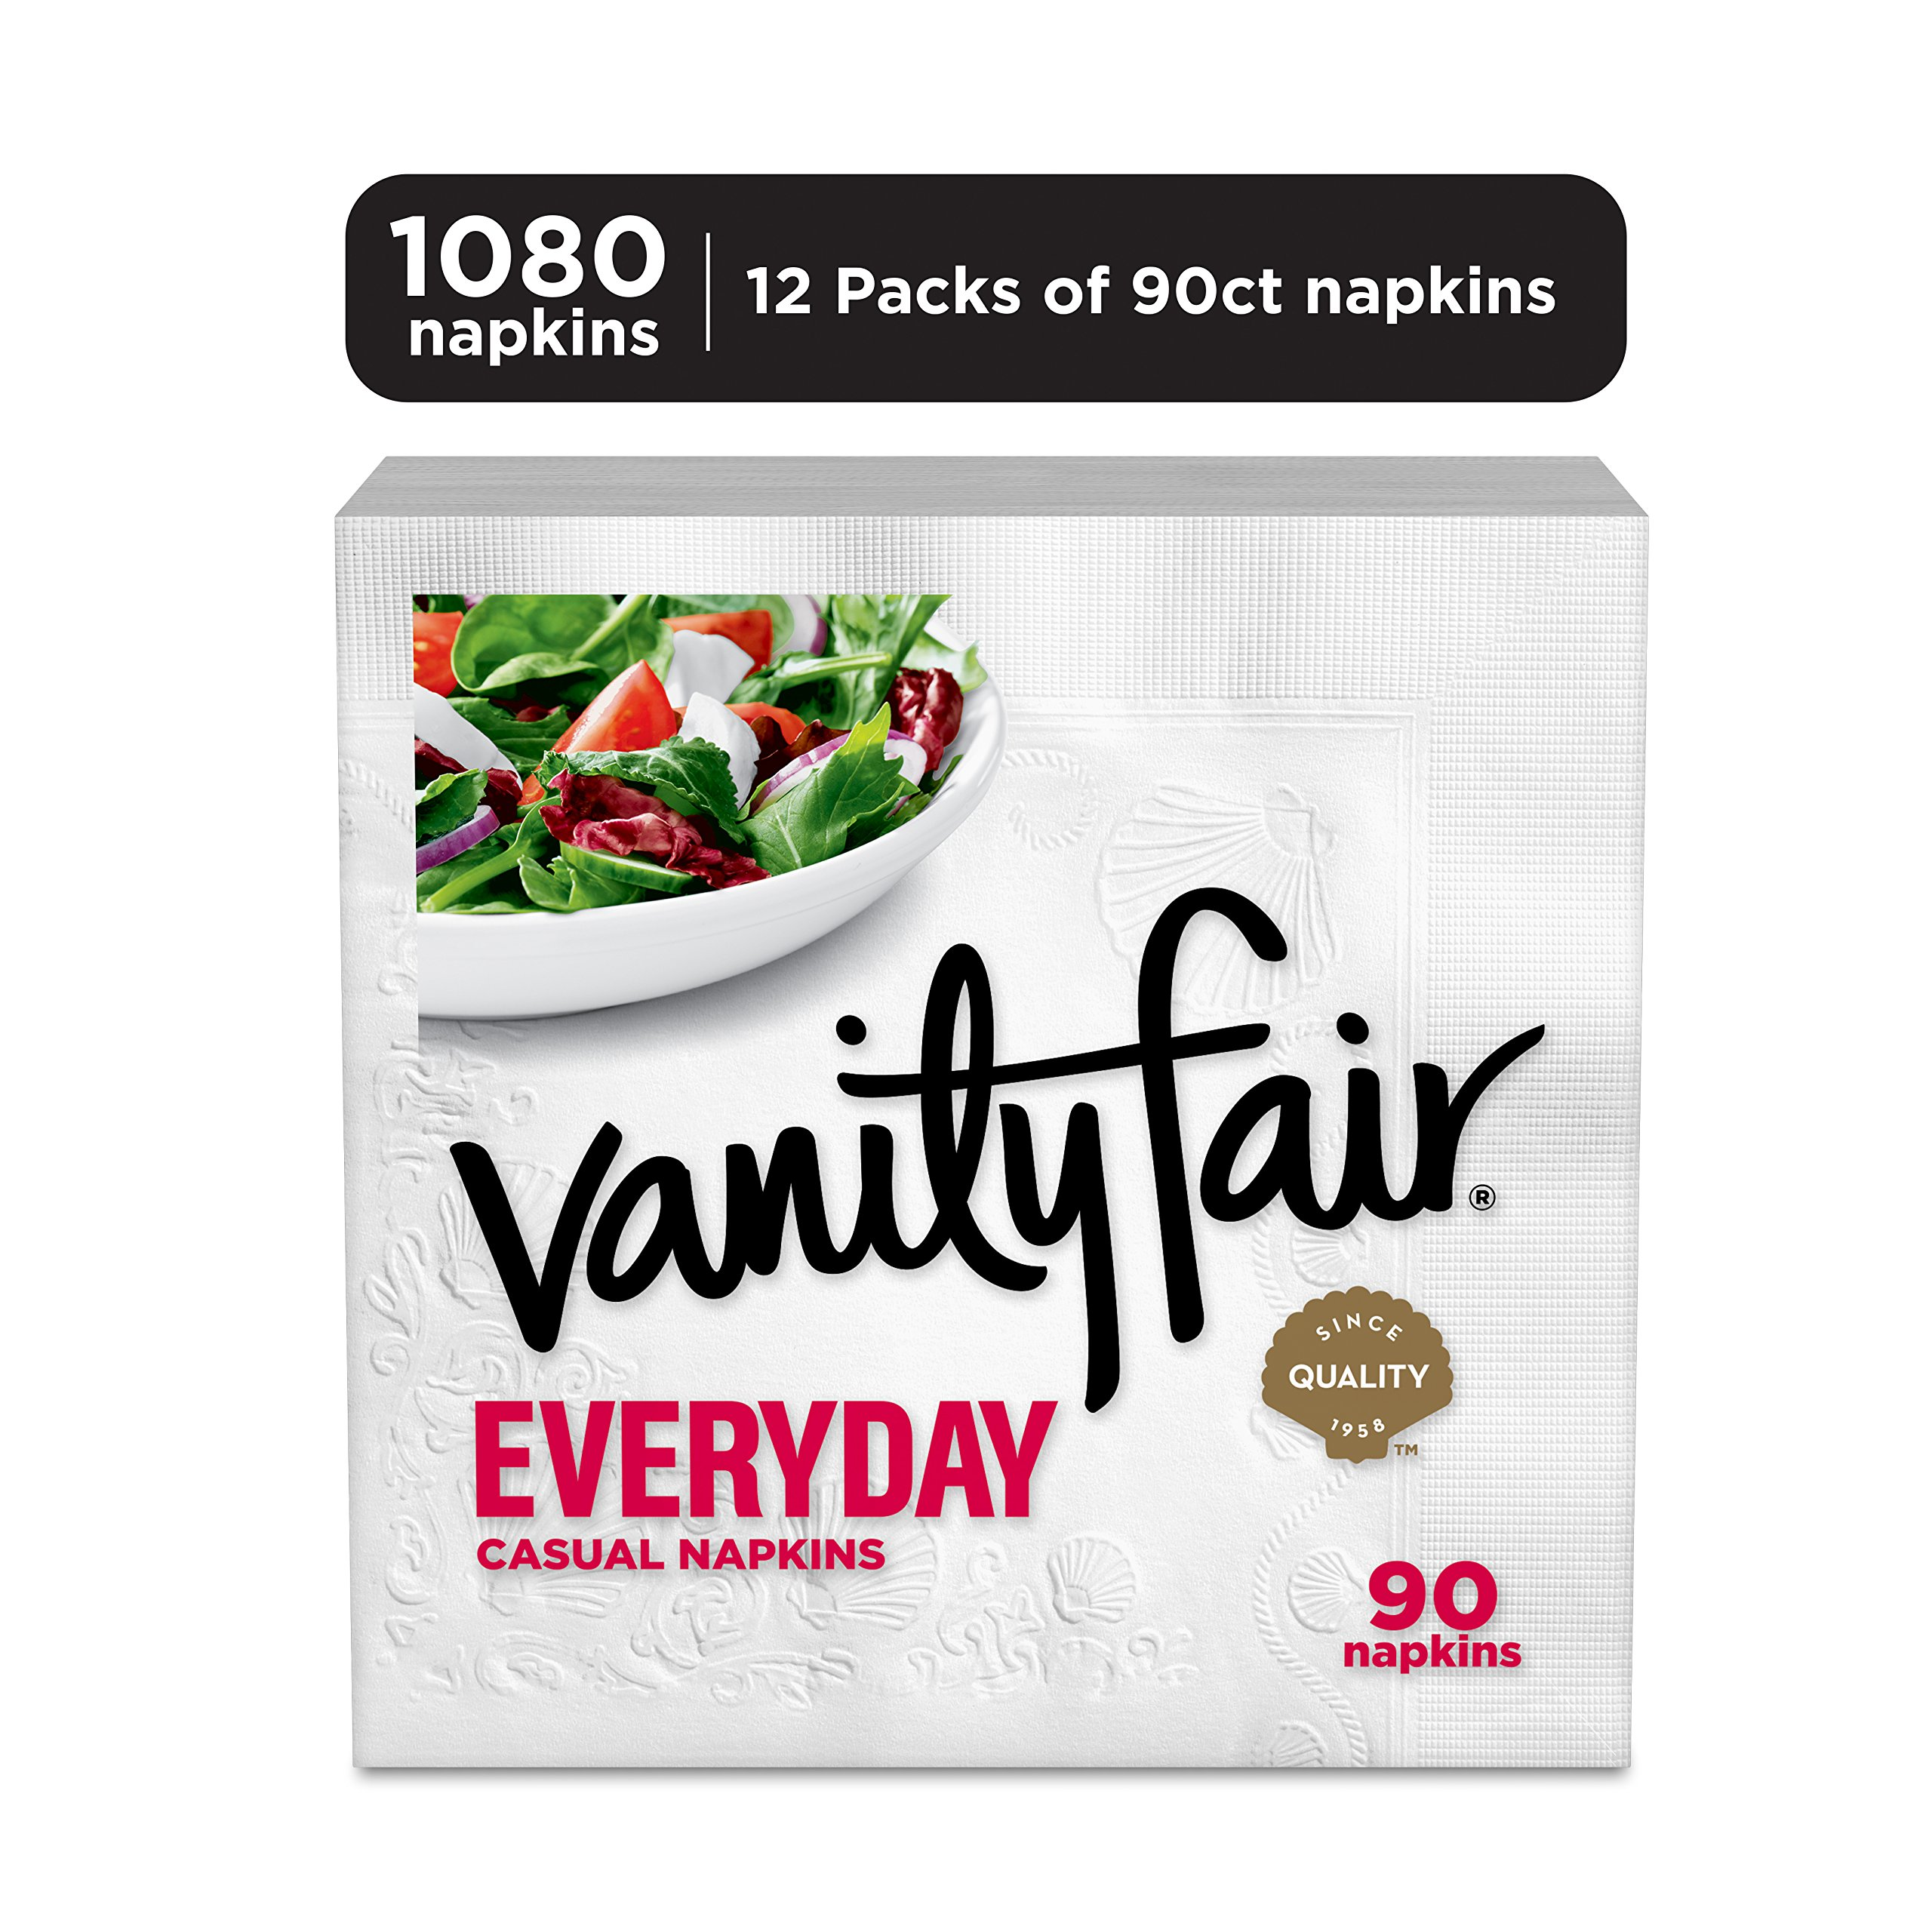 Vanity Fair Everyday Napkins, 1080 Count, White Paper Napkins, 12 Packs of 90 Napkins by Vanity Fair (Image #2)